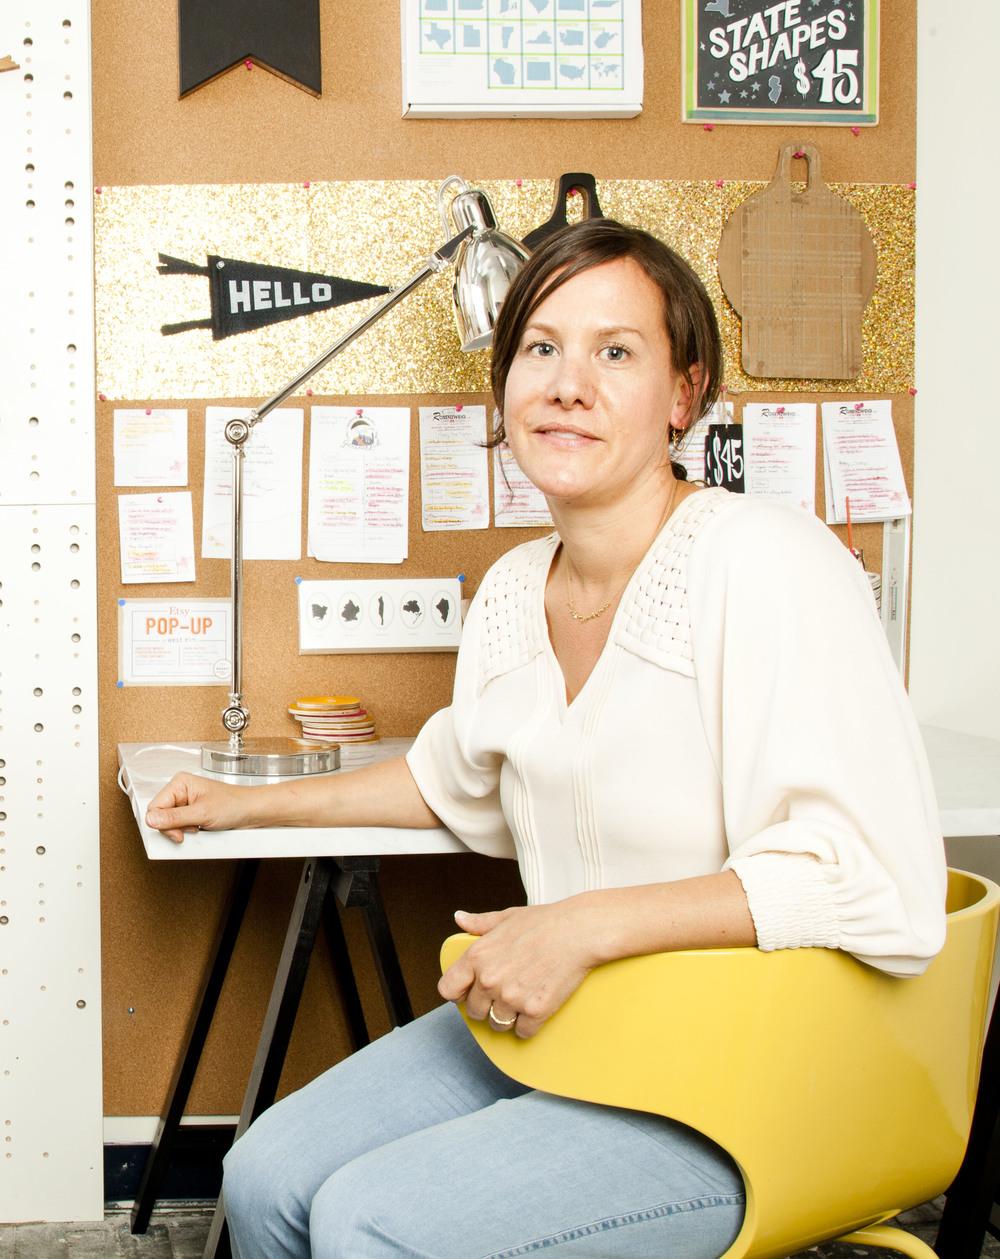 AHeirloom co-founder Amy Stringer-Mowat